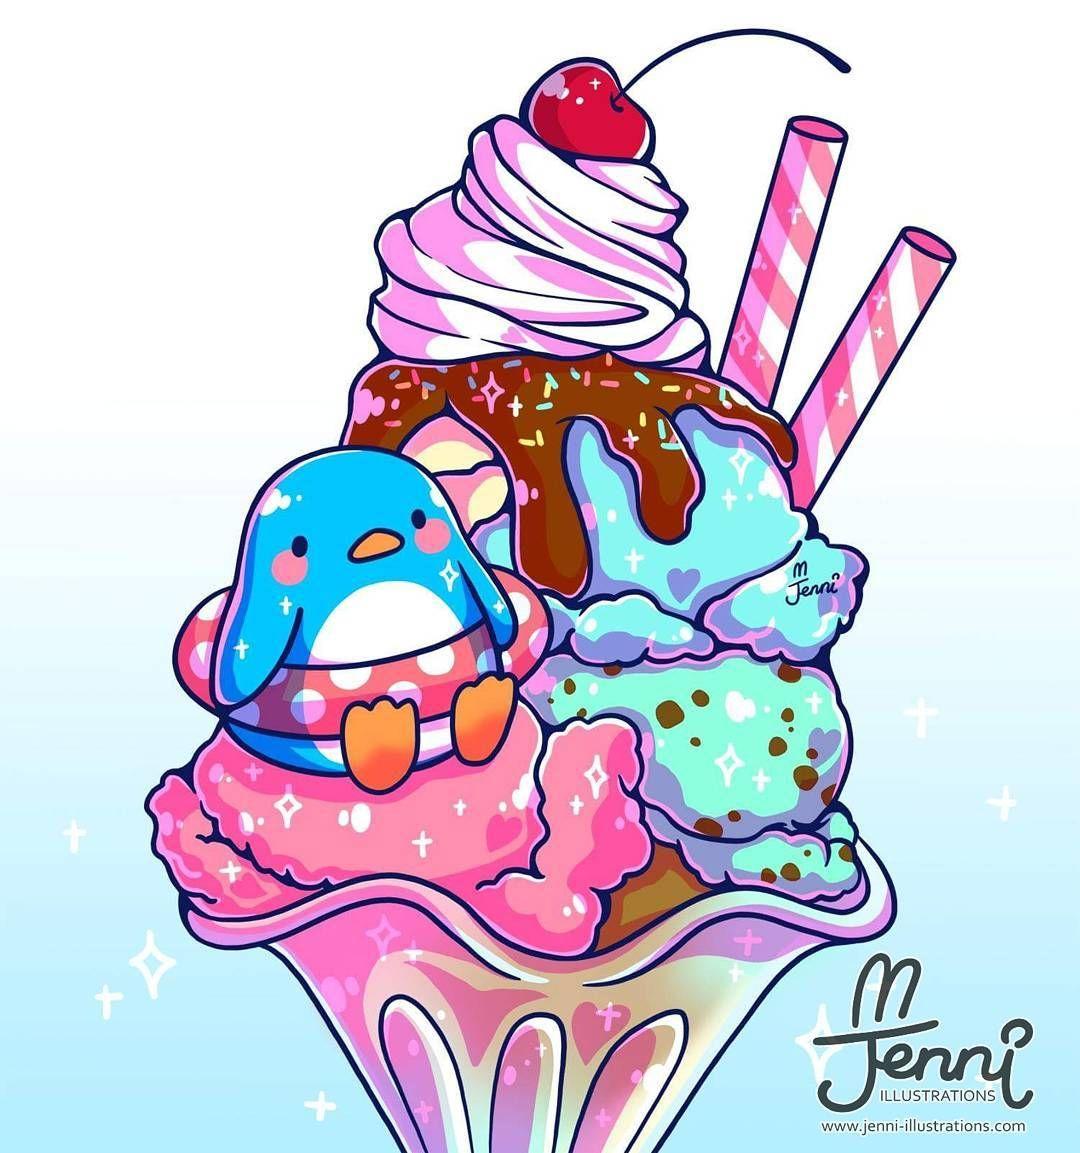 Its Cold Here Yet I Still Drew Some Ice Cream Lol Icecream Penguin Sundae Foodart Jen Cute Kawaii Drawings Cute Animal Drawings Cute Drawings